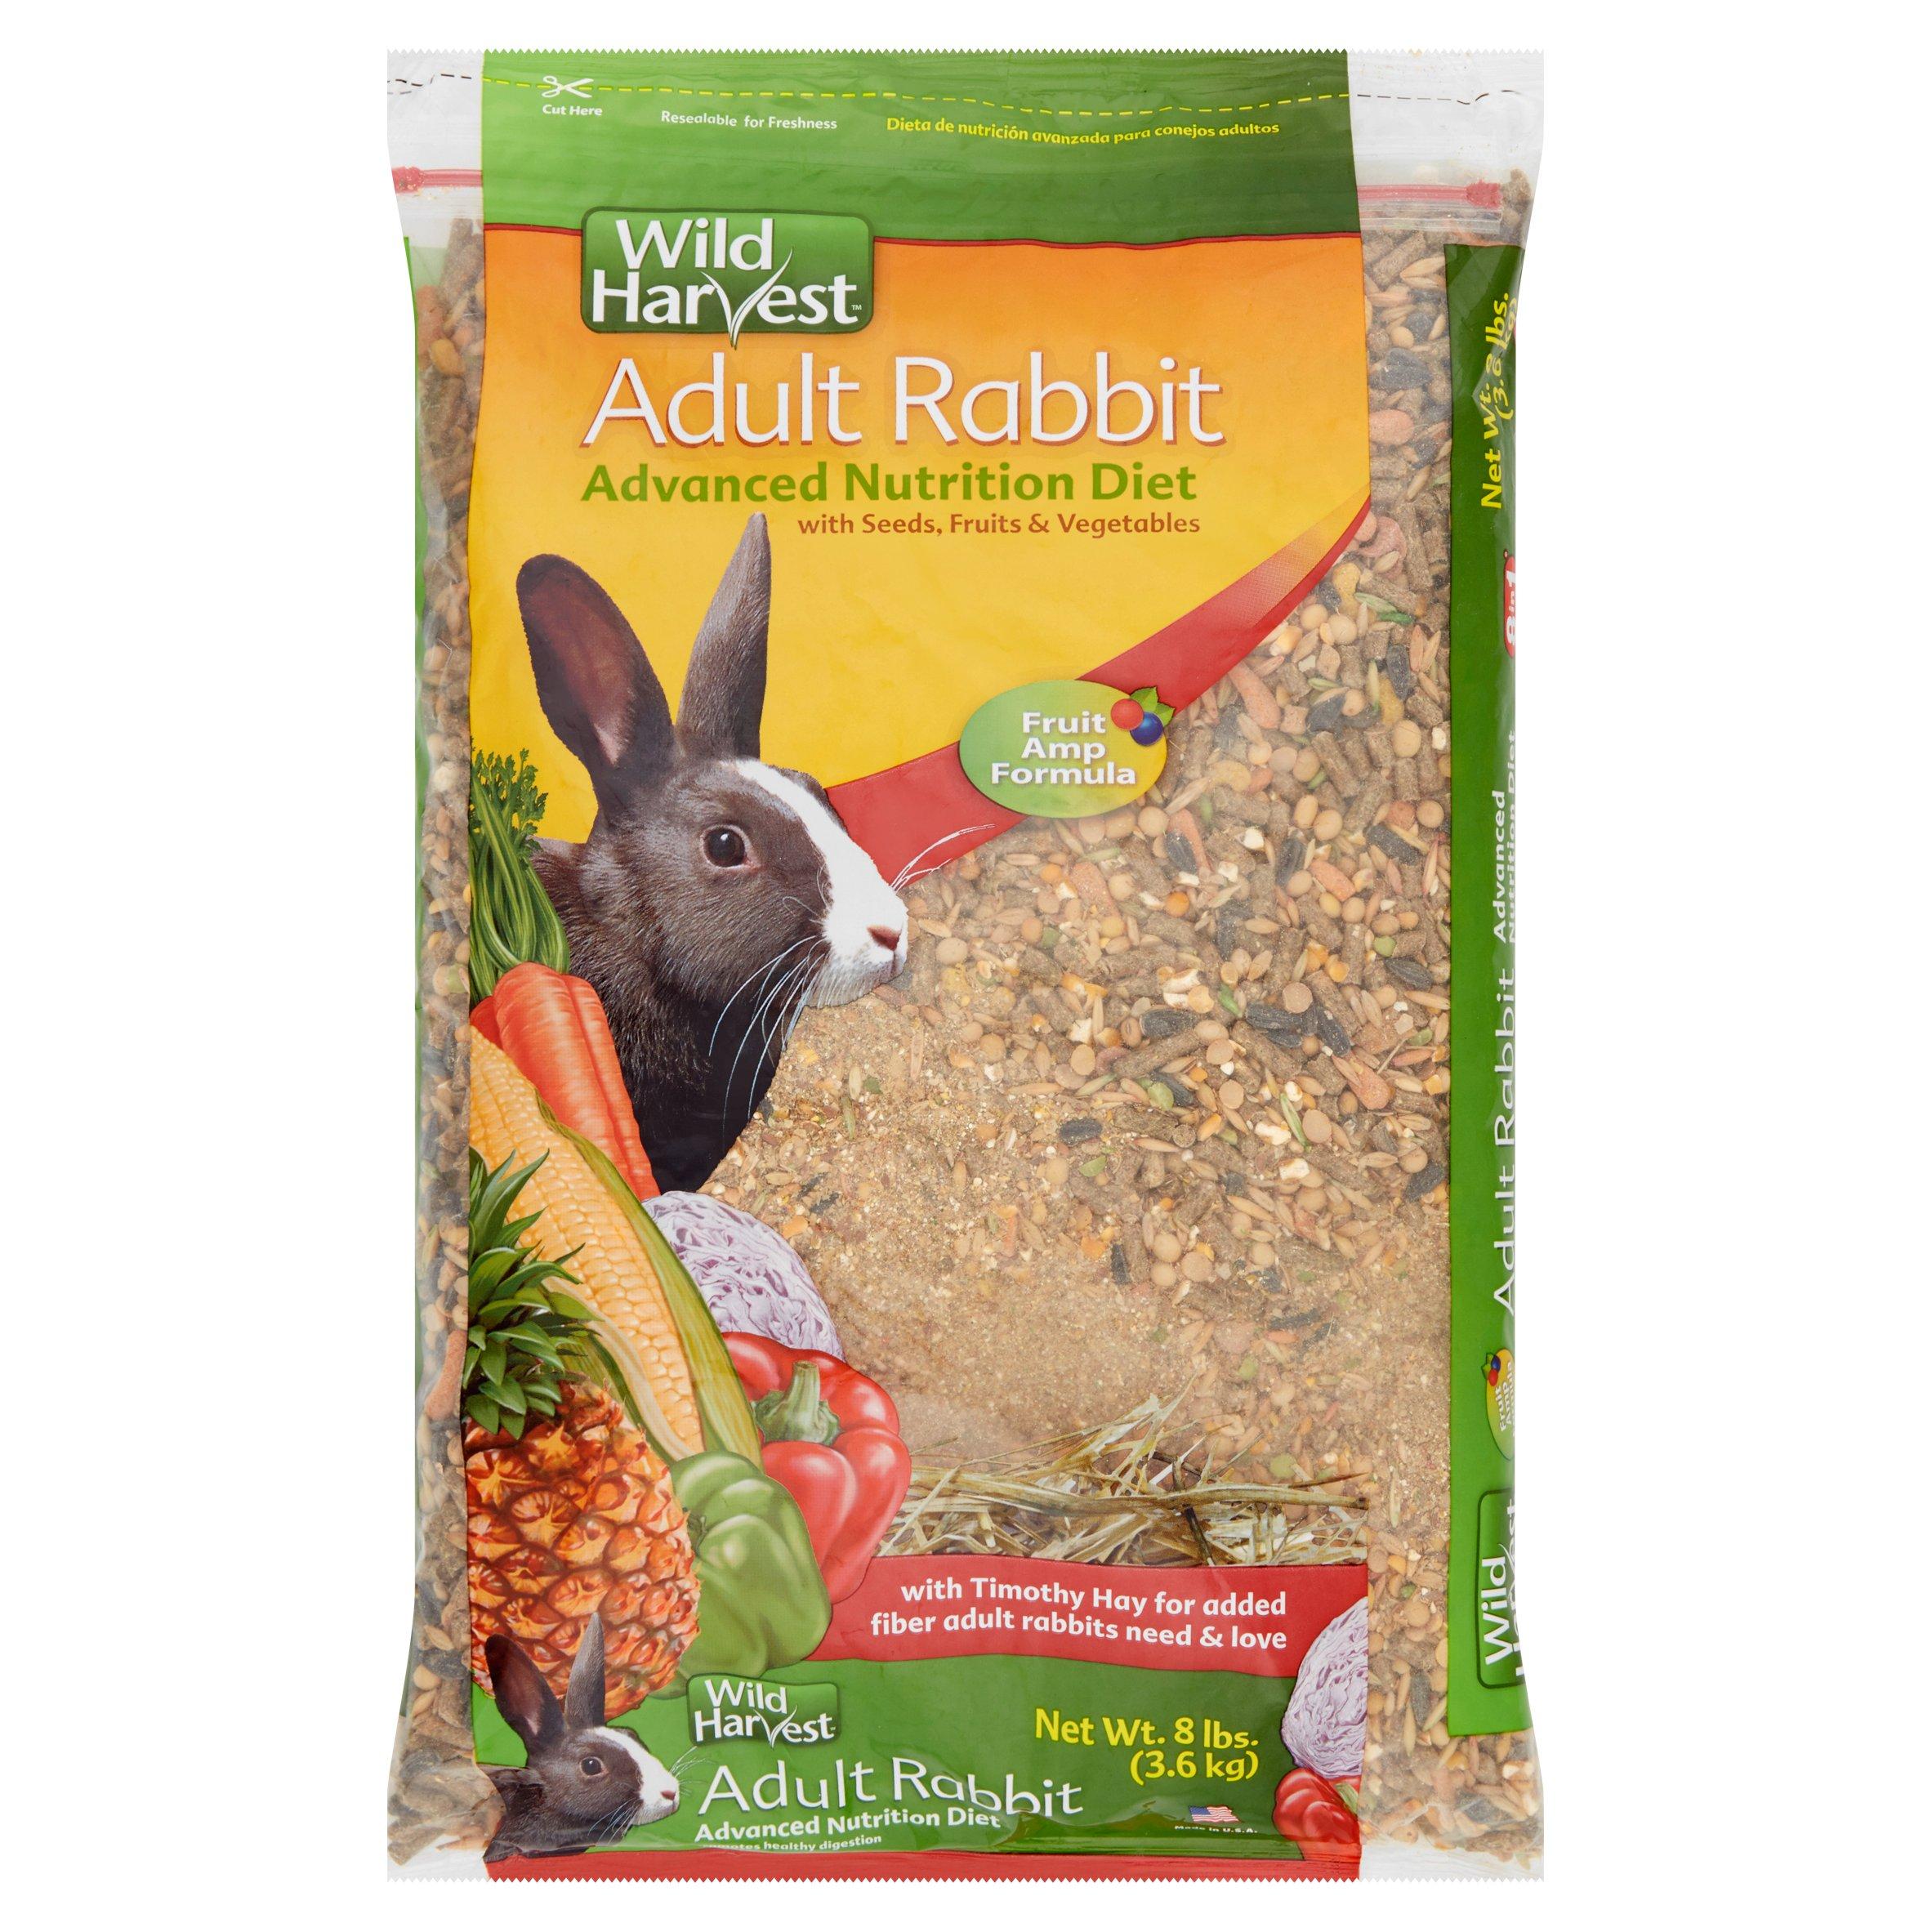 Wild Harvest Advanced Nutrition Diet Dry Adult Rabbit Food, 8 lbs